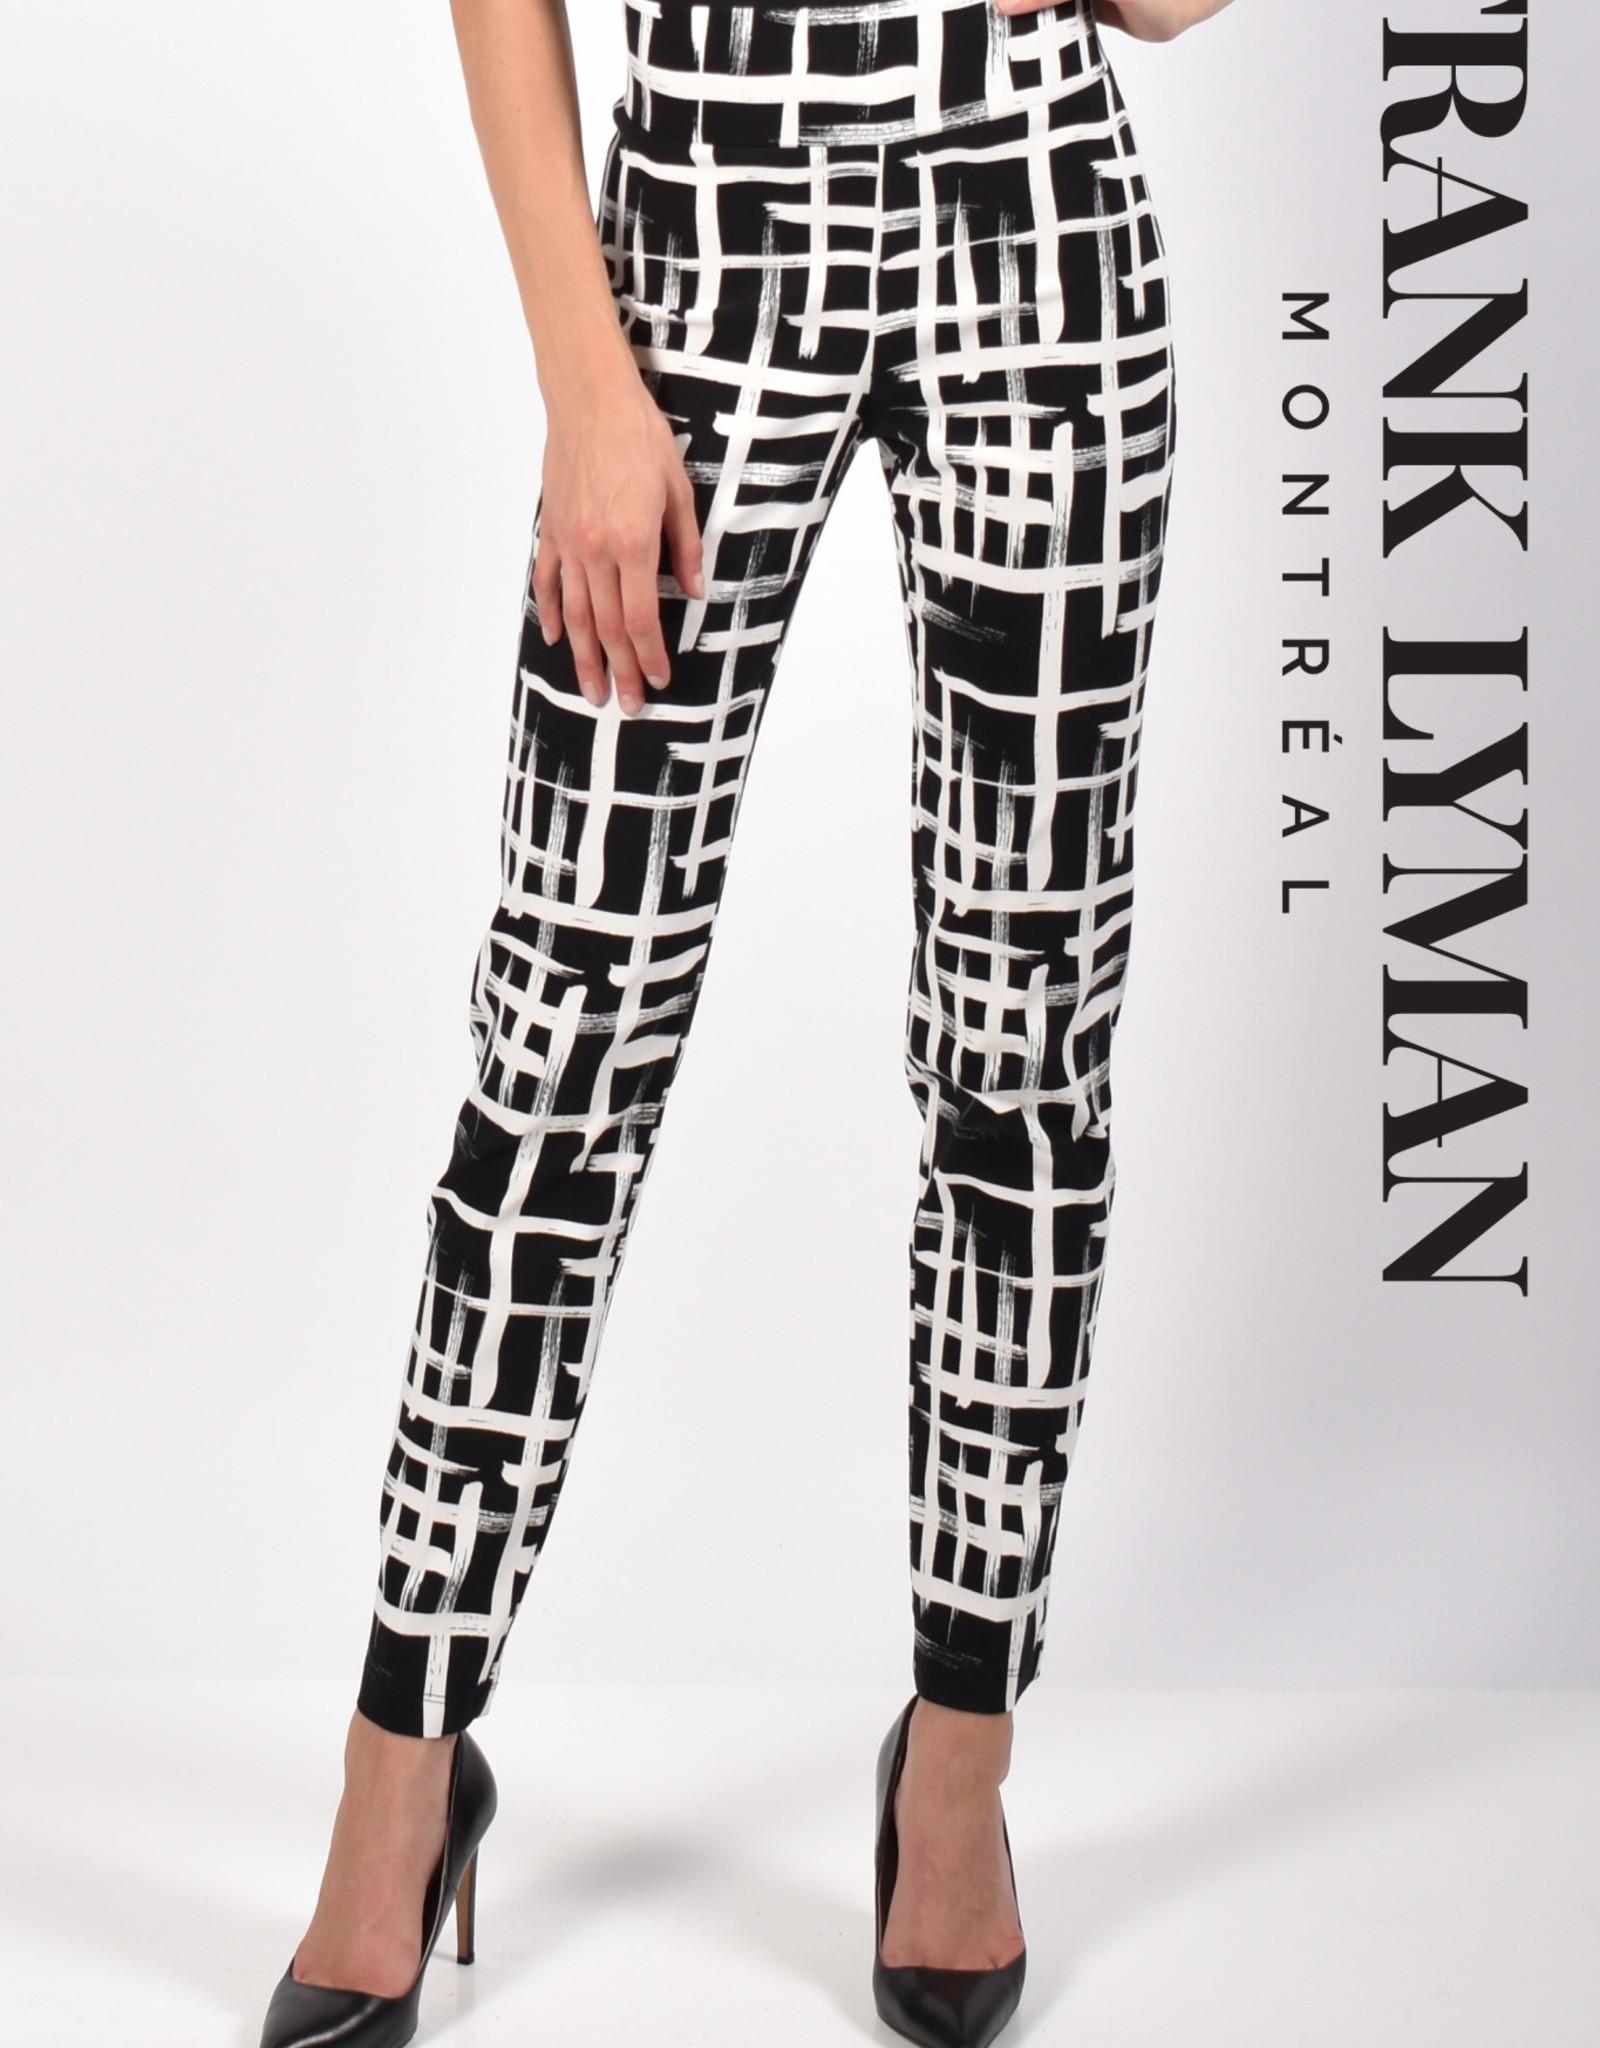 Frank Lyman Frank Lyman 216388 Woven Pant in a Fun Edgy Checkered Pattern